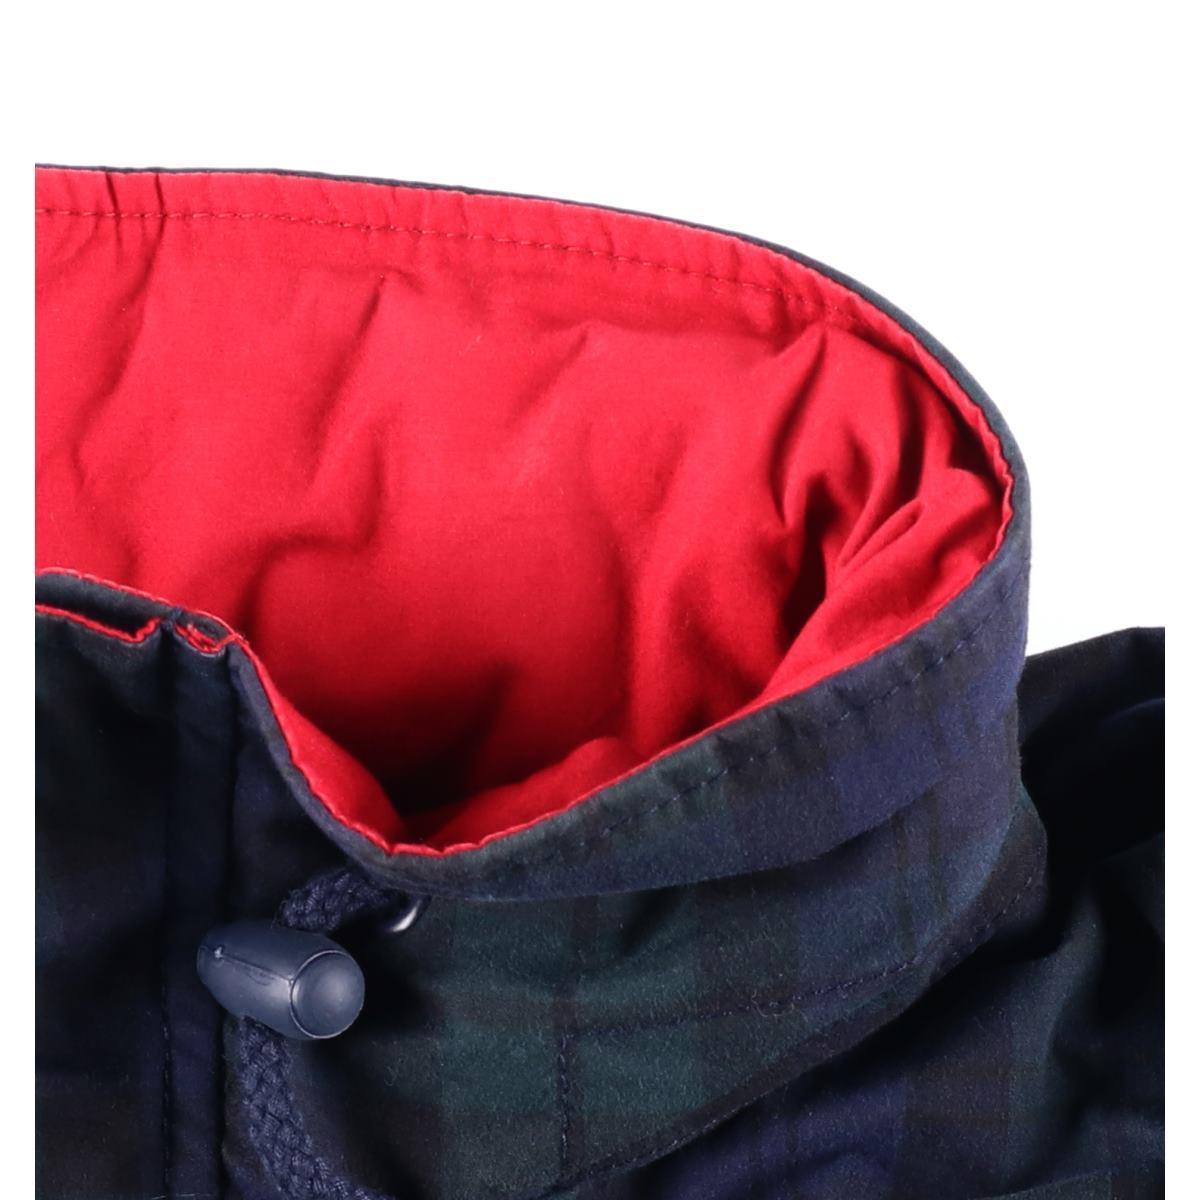 90s トミーヒルフィガー TOMMY HILFIGER Black Watch check food storing model sailing down jacket men XL wbf3010